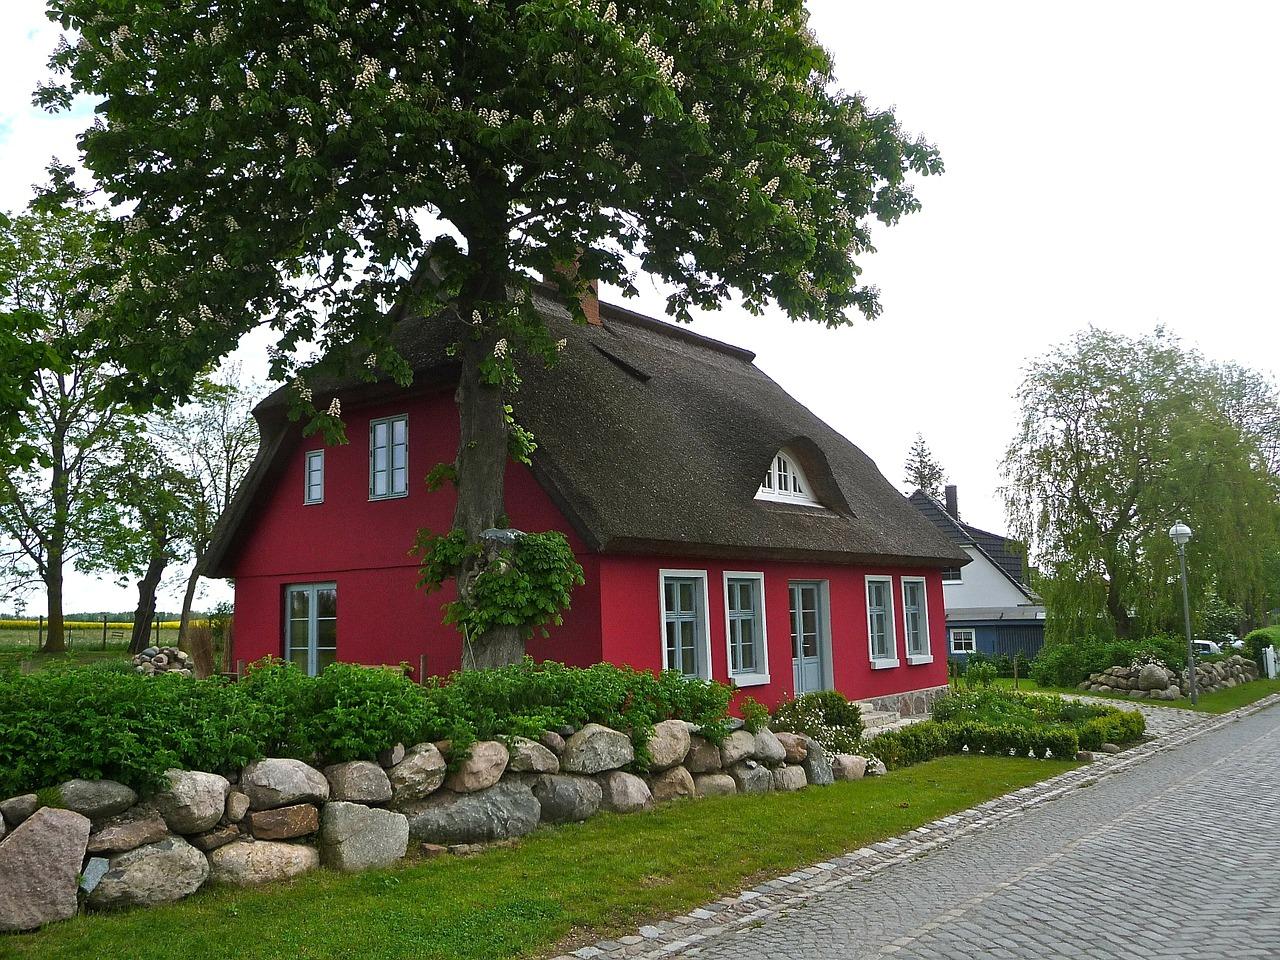 Einfamilienhaus rot Reetdach